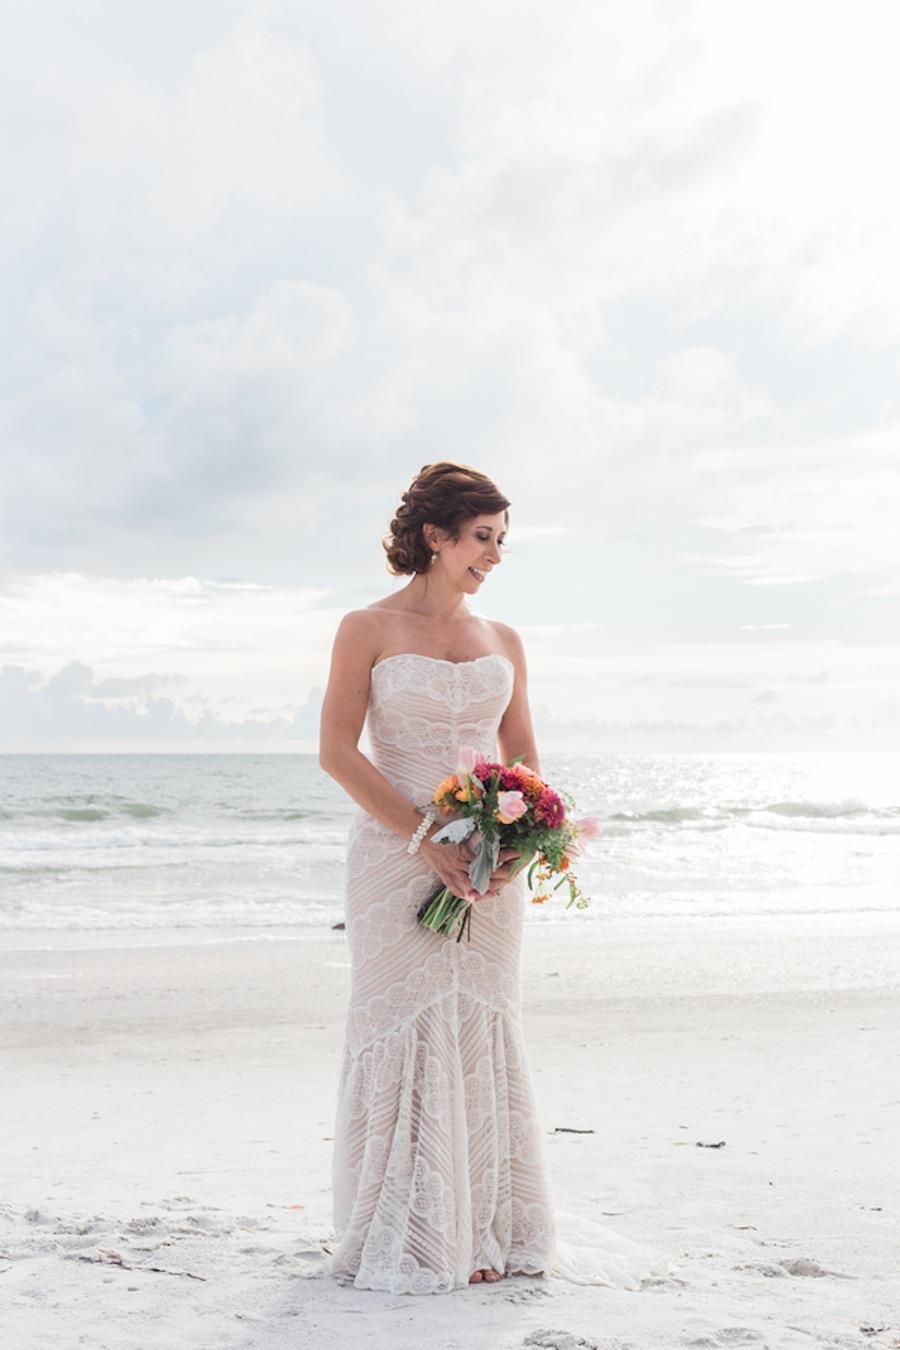 Treasure Island/Clearwater Beach Bride on Wedding Day | Jillian Joseph Photography